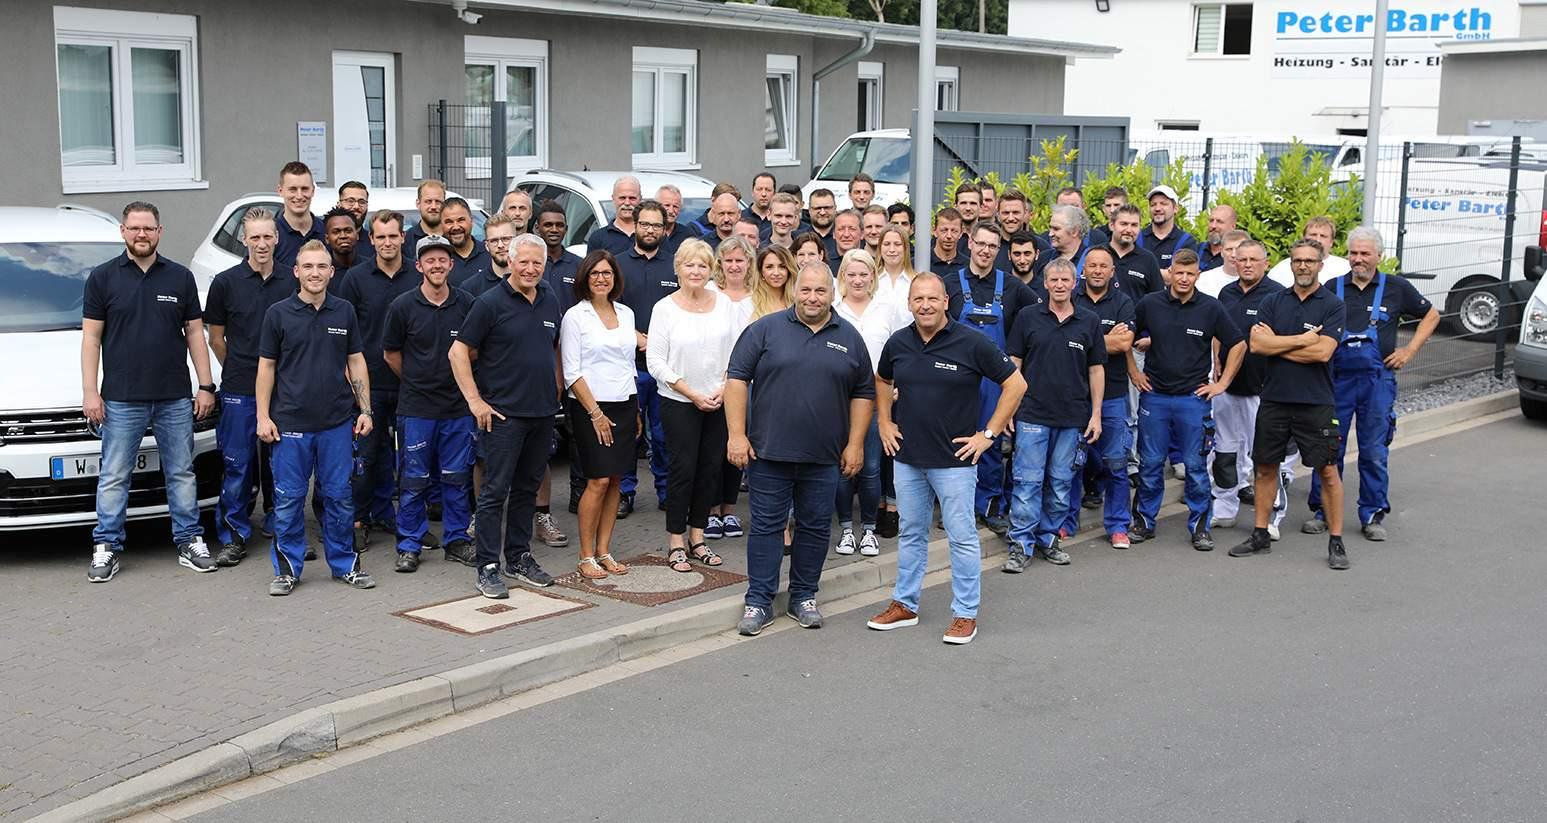 Das Team der Peter Barth GmbH Wuppertal